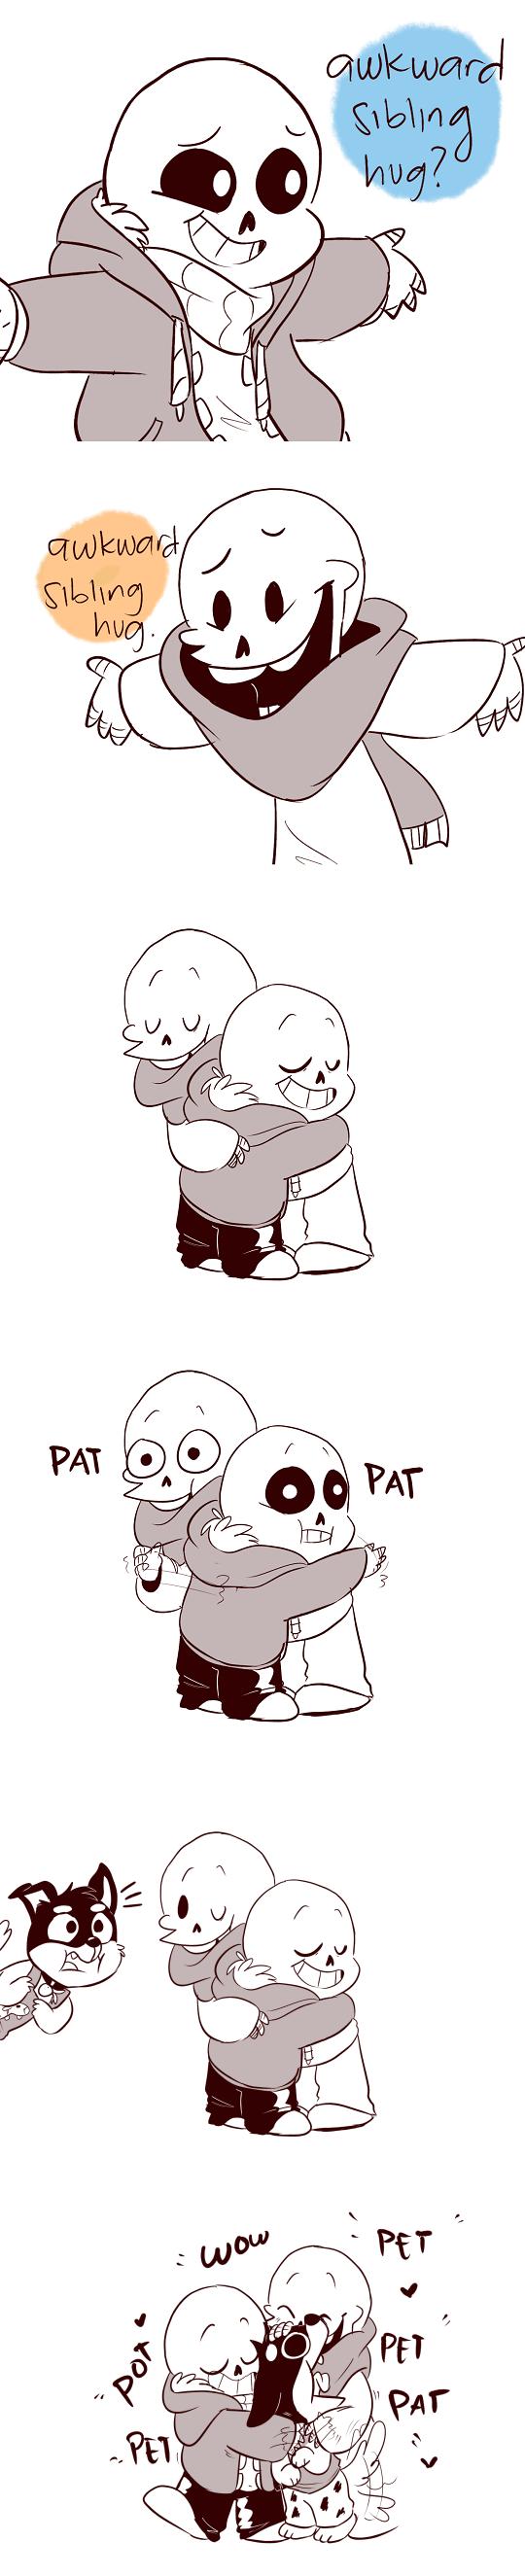 awkward sibling hug undertale know your meme